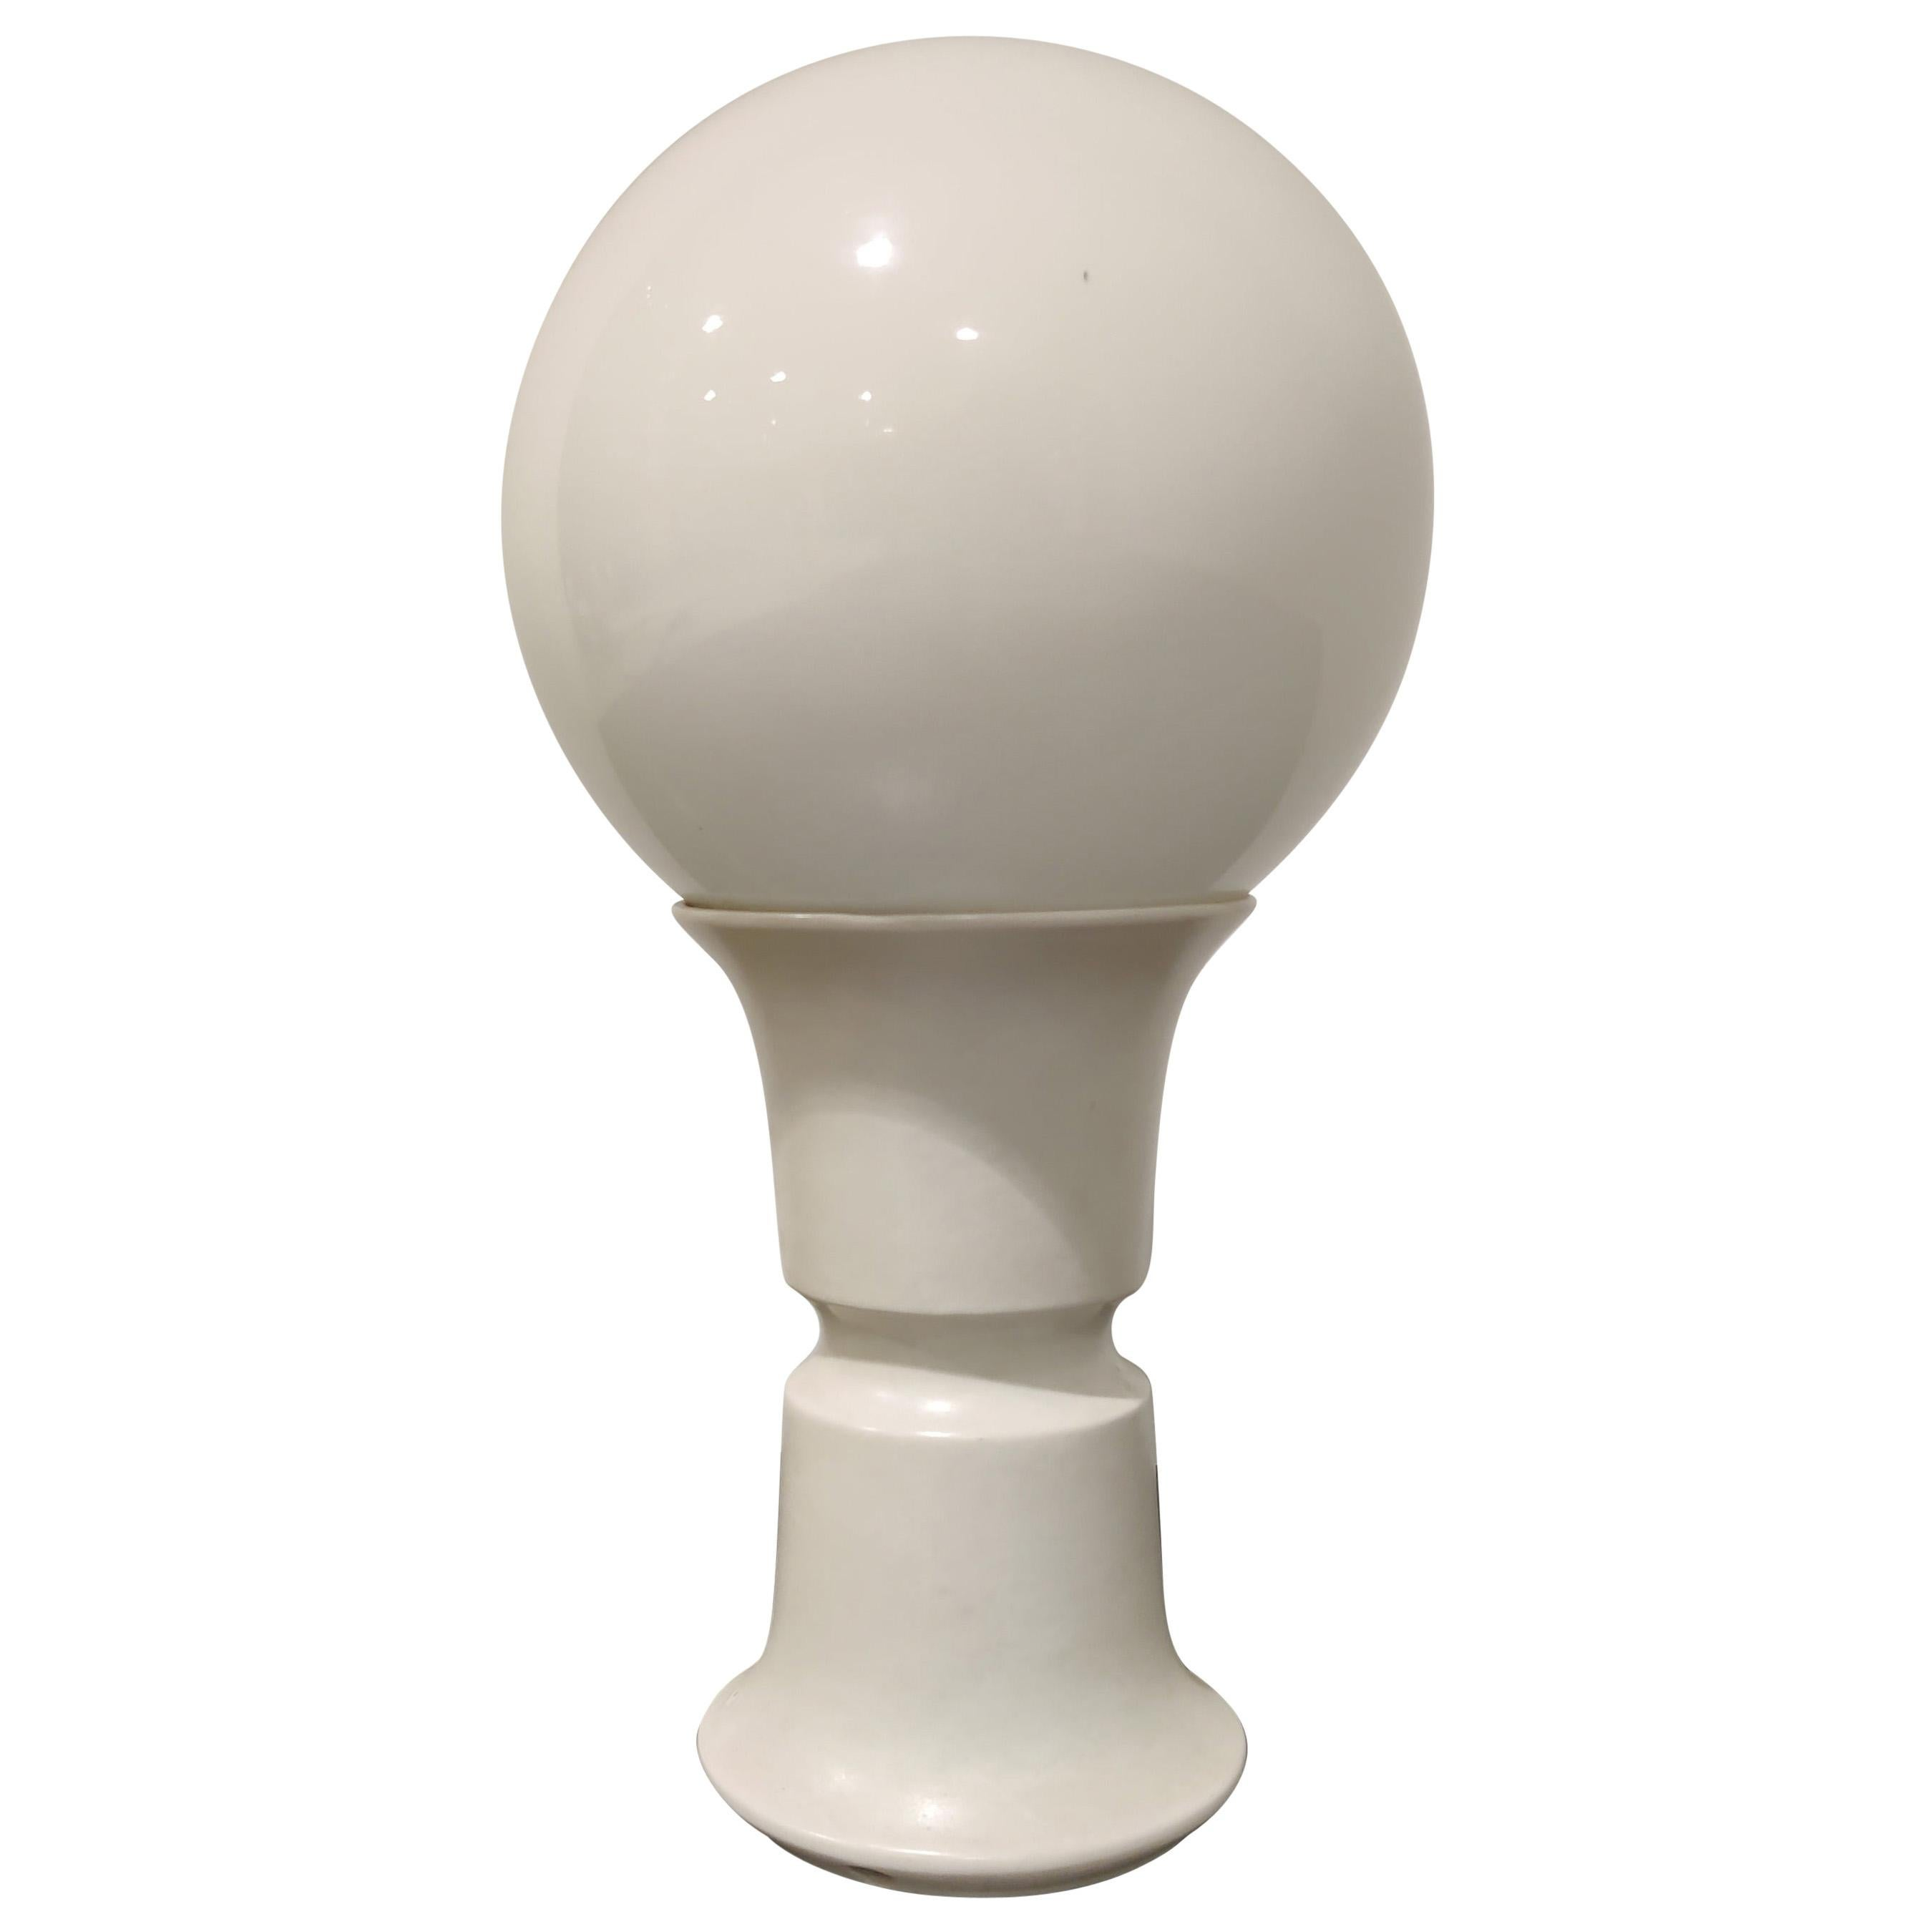 Midcentury Globe Table Lamp, 1970s